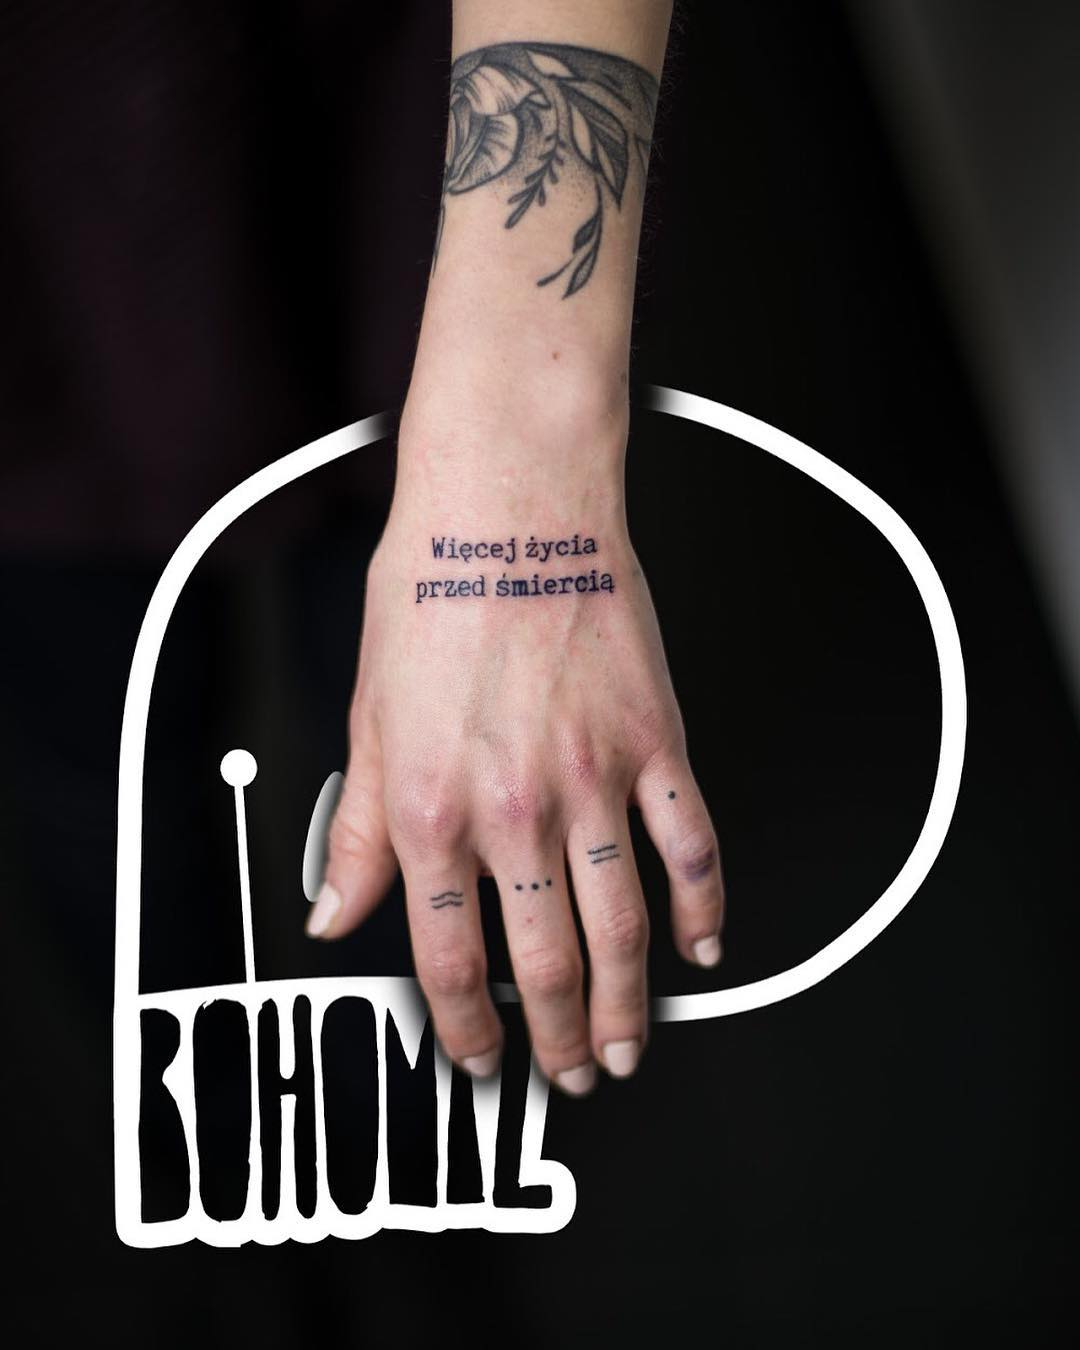 Cool Dot Work Hand Tattoo - Blurmark